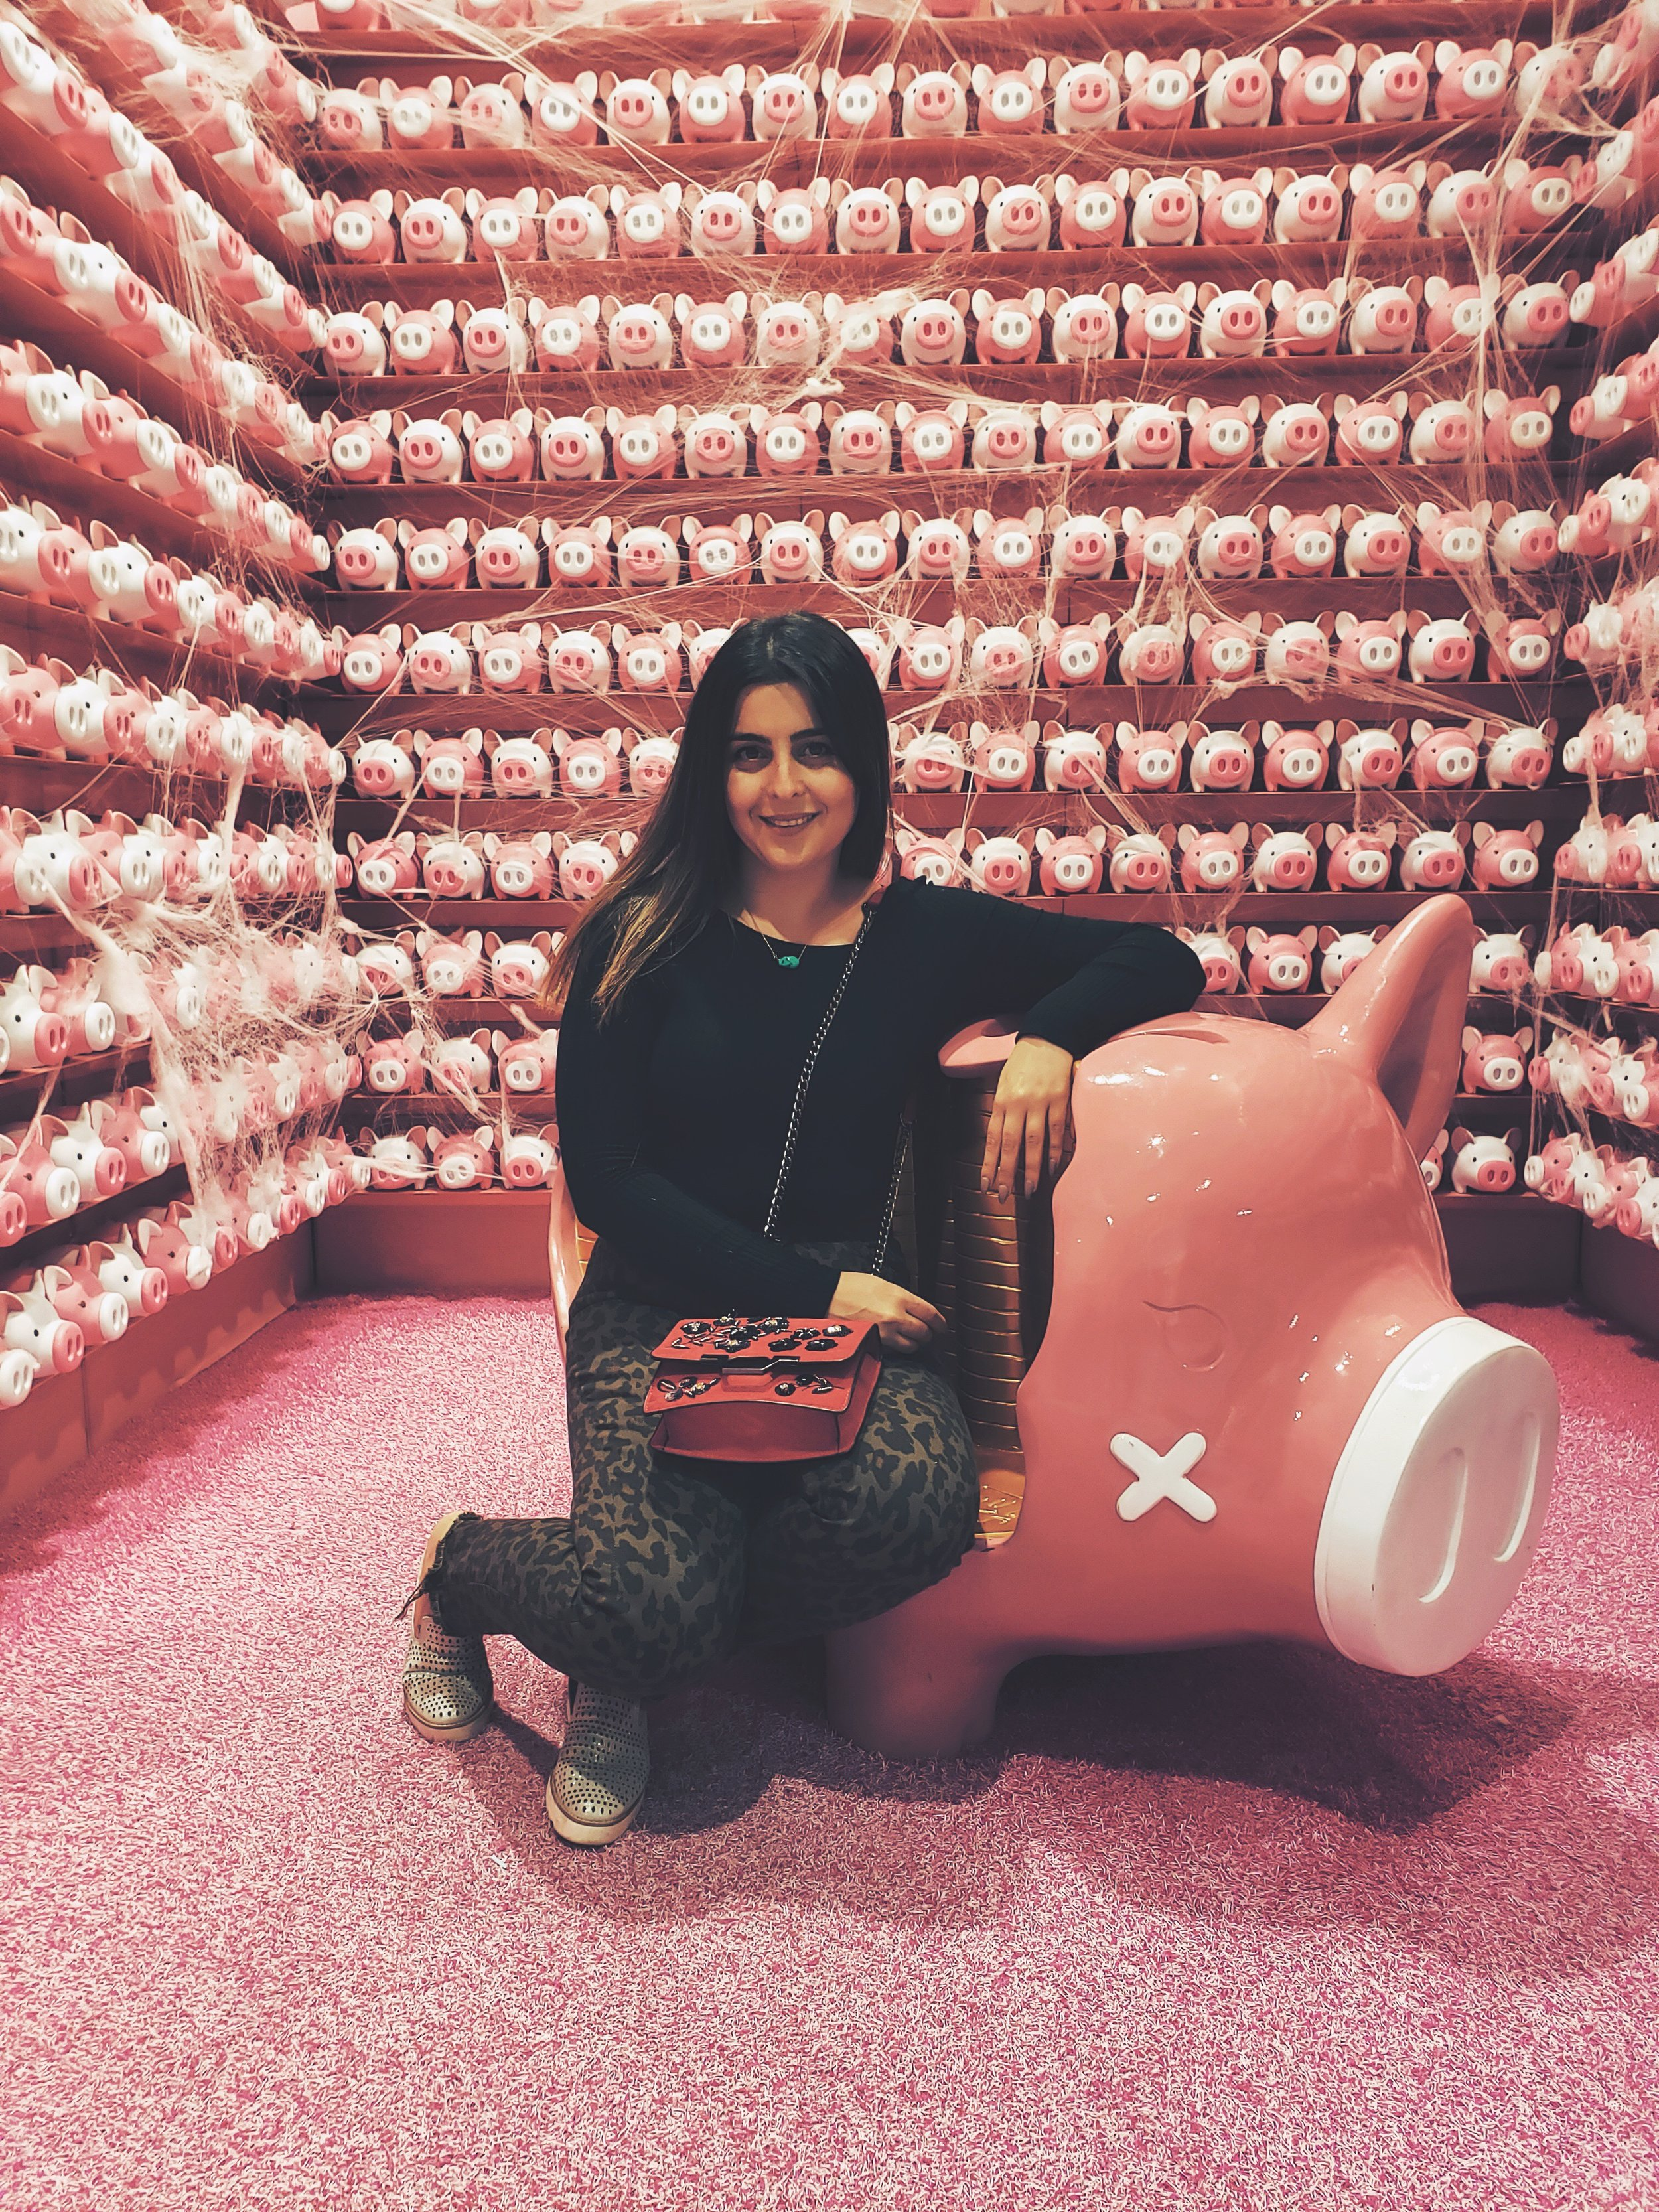 My kind of piggy bank!